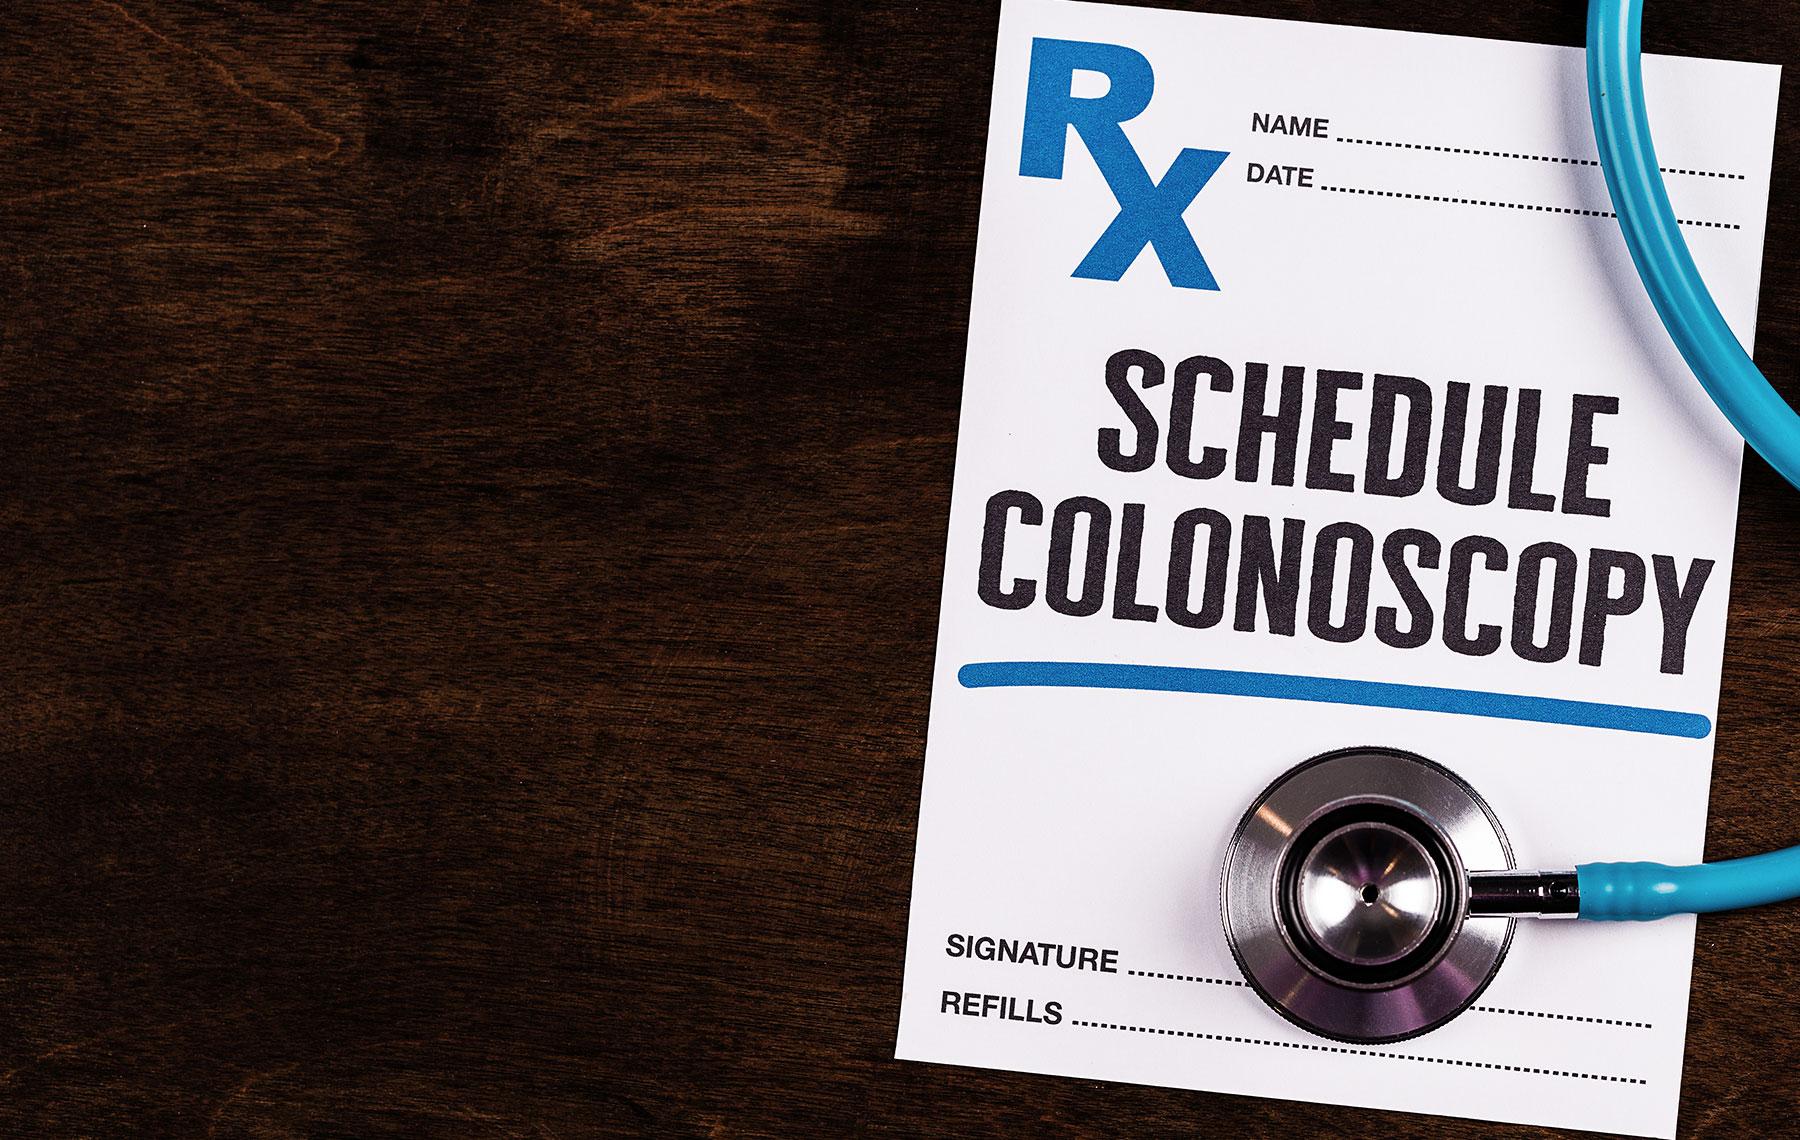 Colonoscopy paper